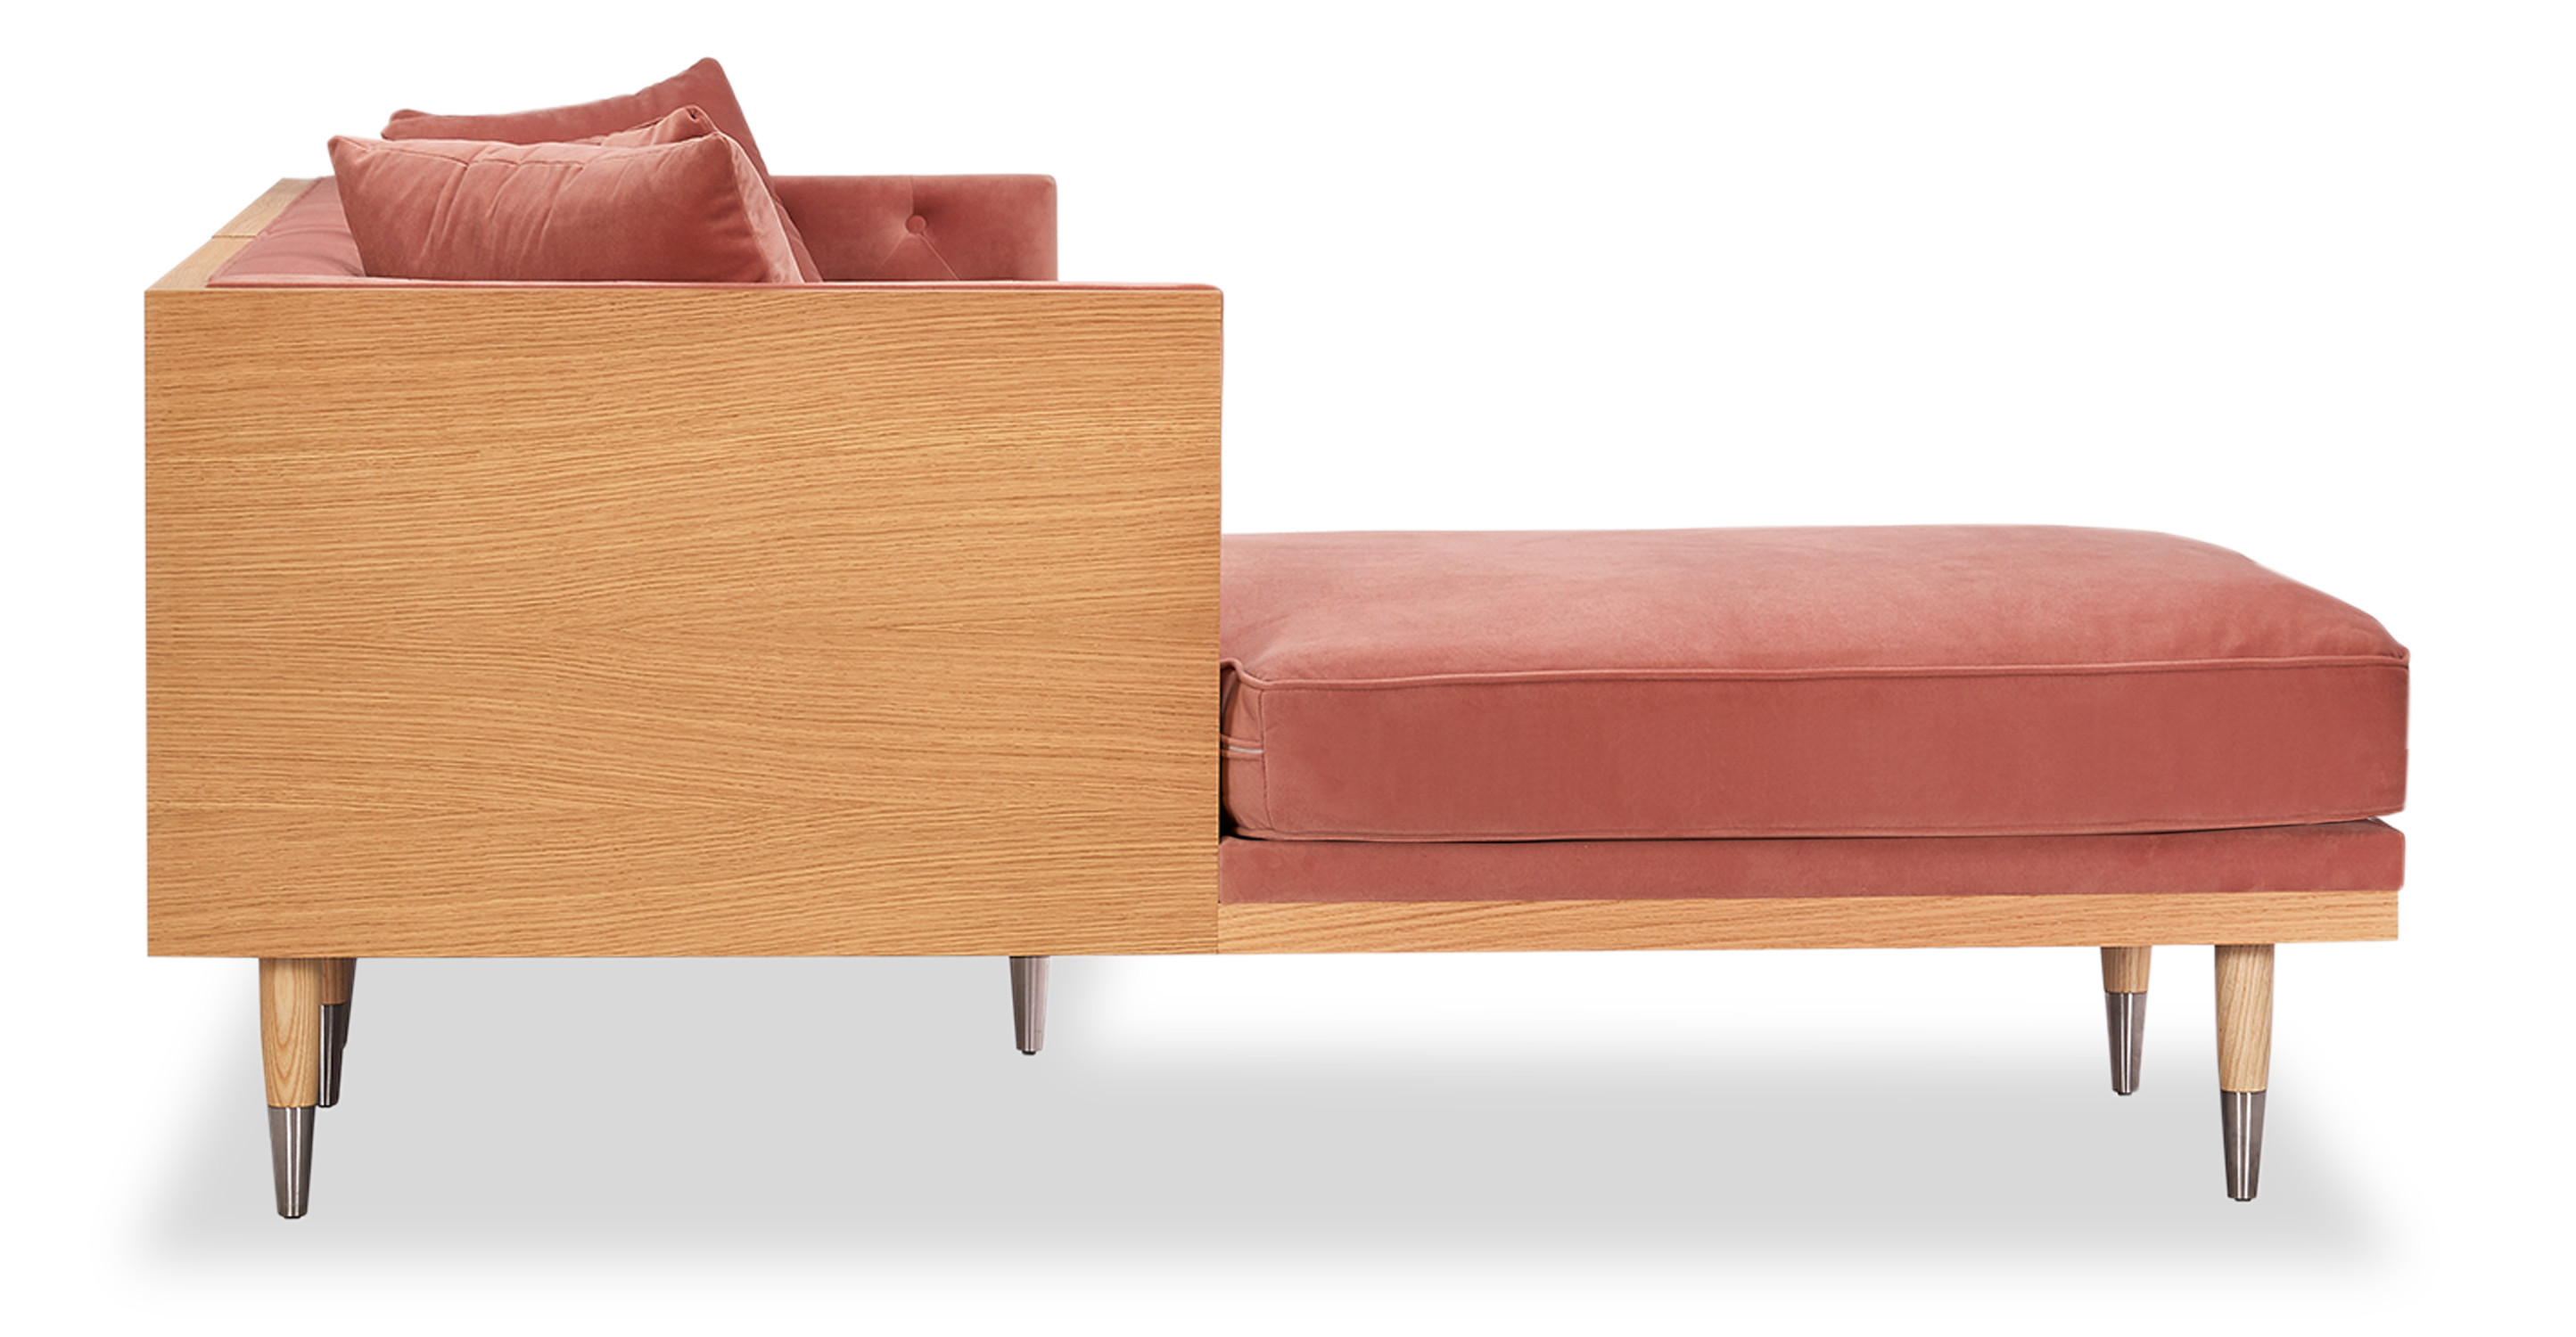 "Woodrow Neo 99"" Sofa Sectional Left, Ash/Blush"